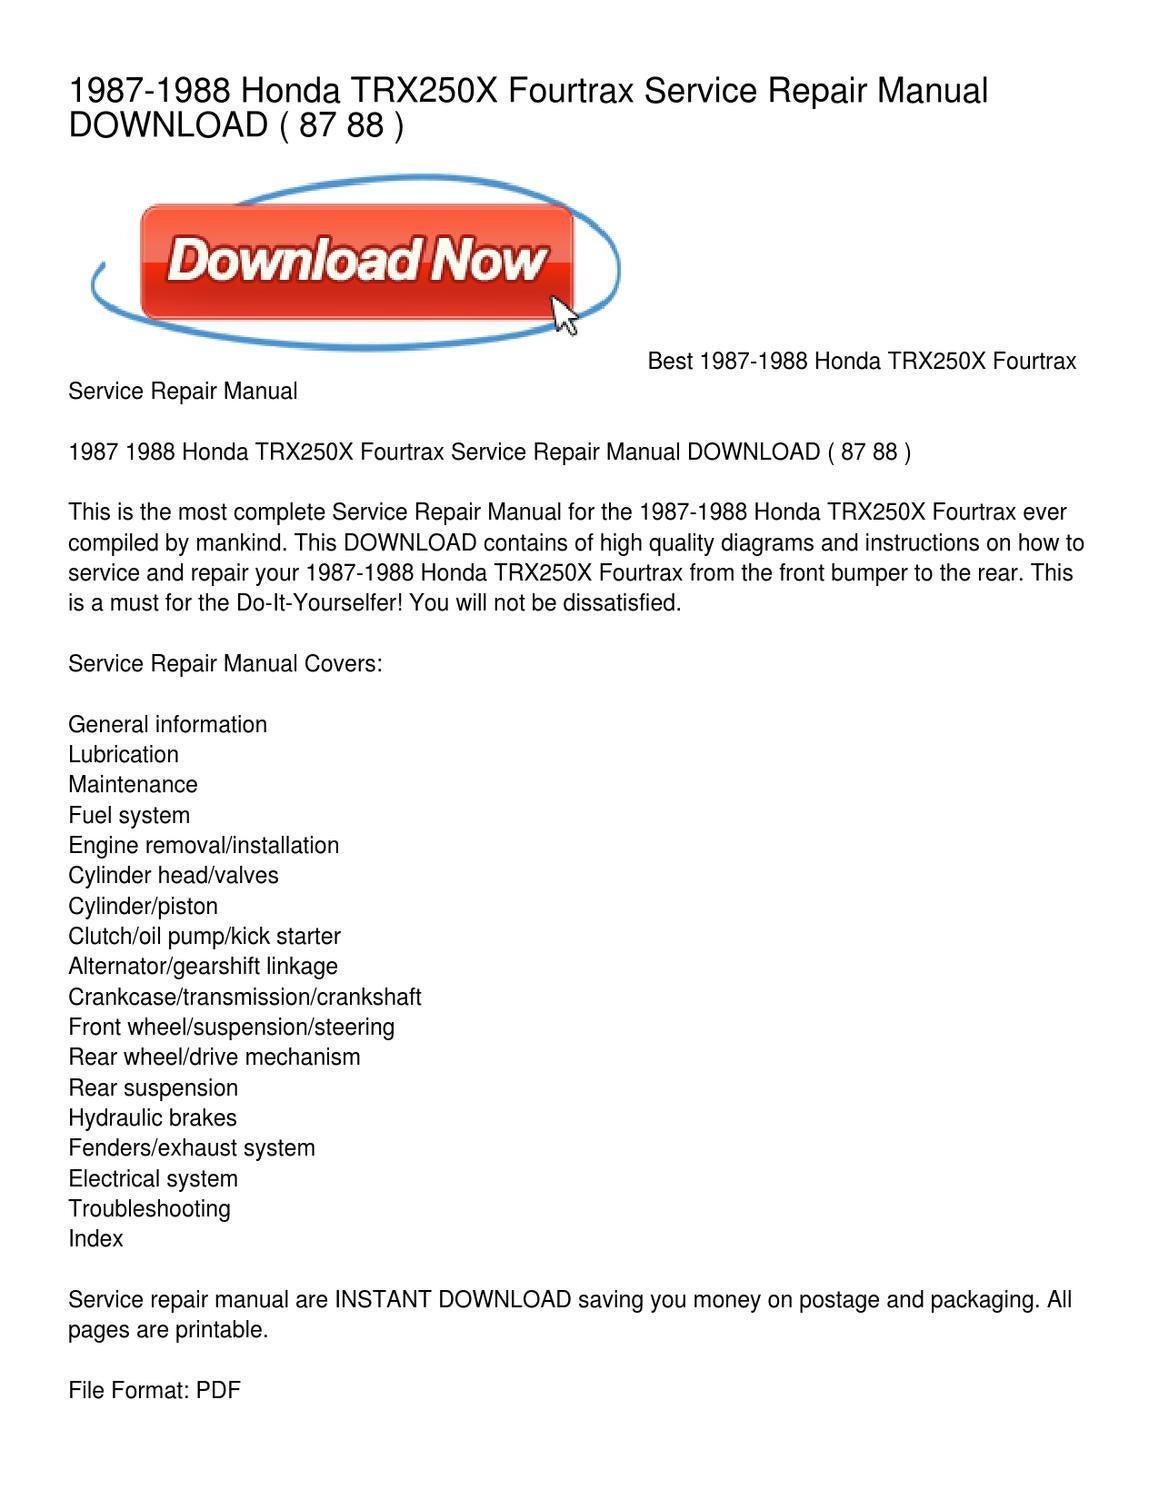 1987 honda trx250x service manual free download